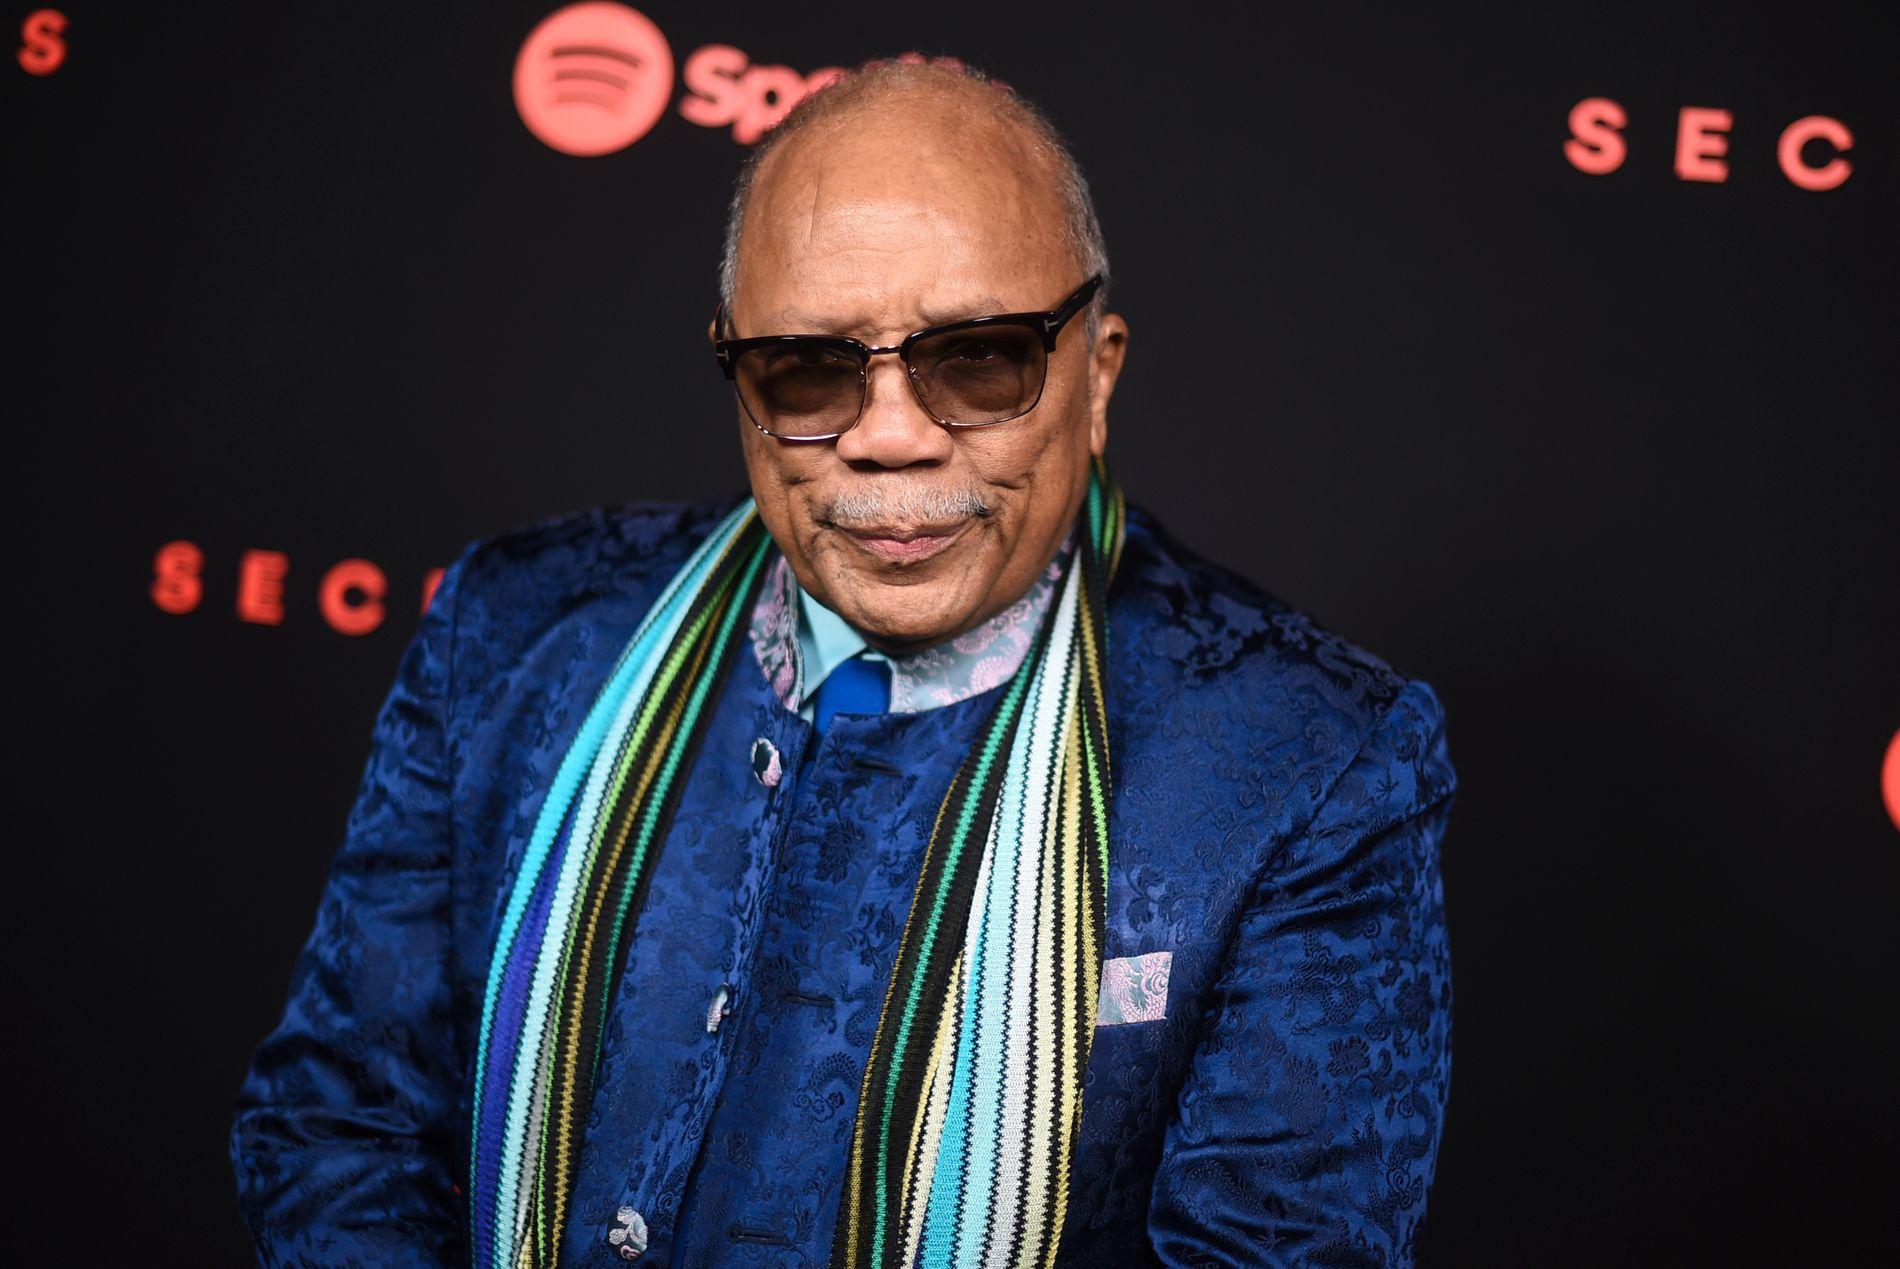 SNAKKER UT: Quincy Jones.